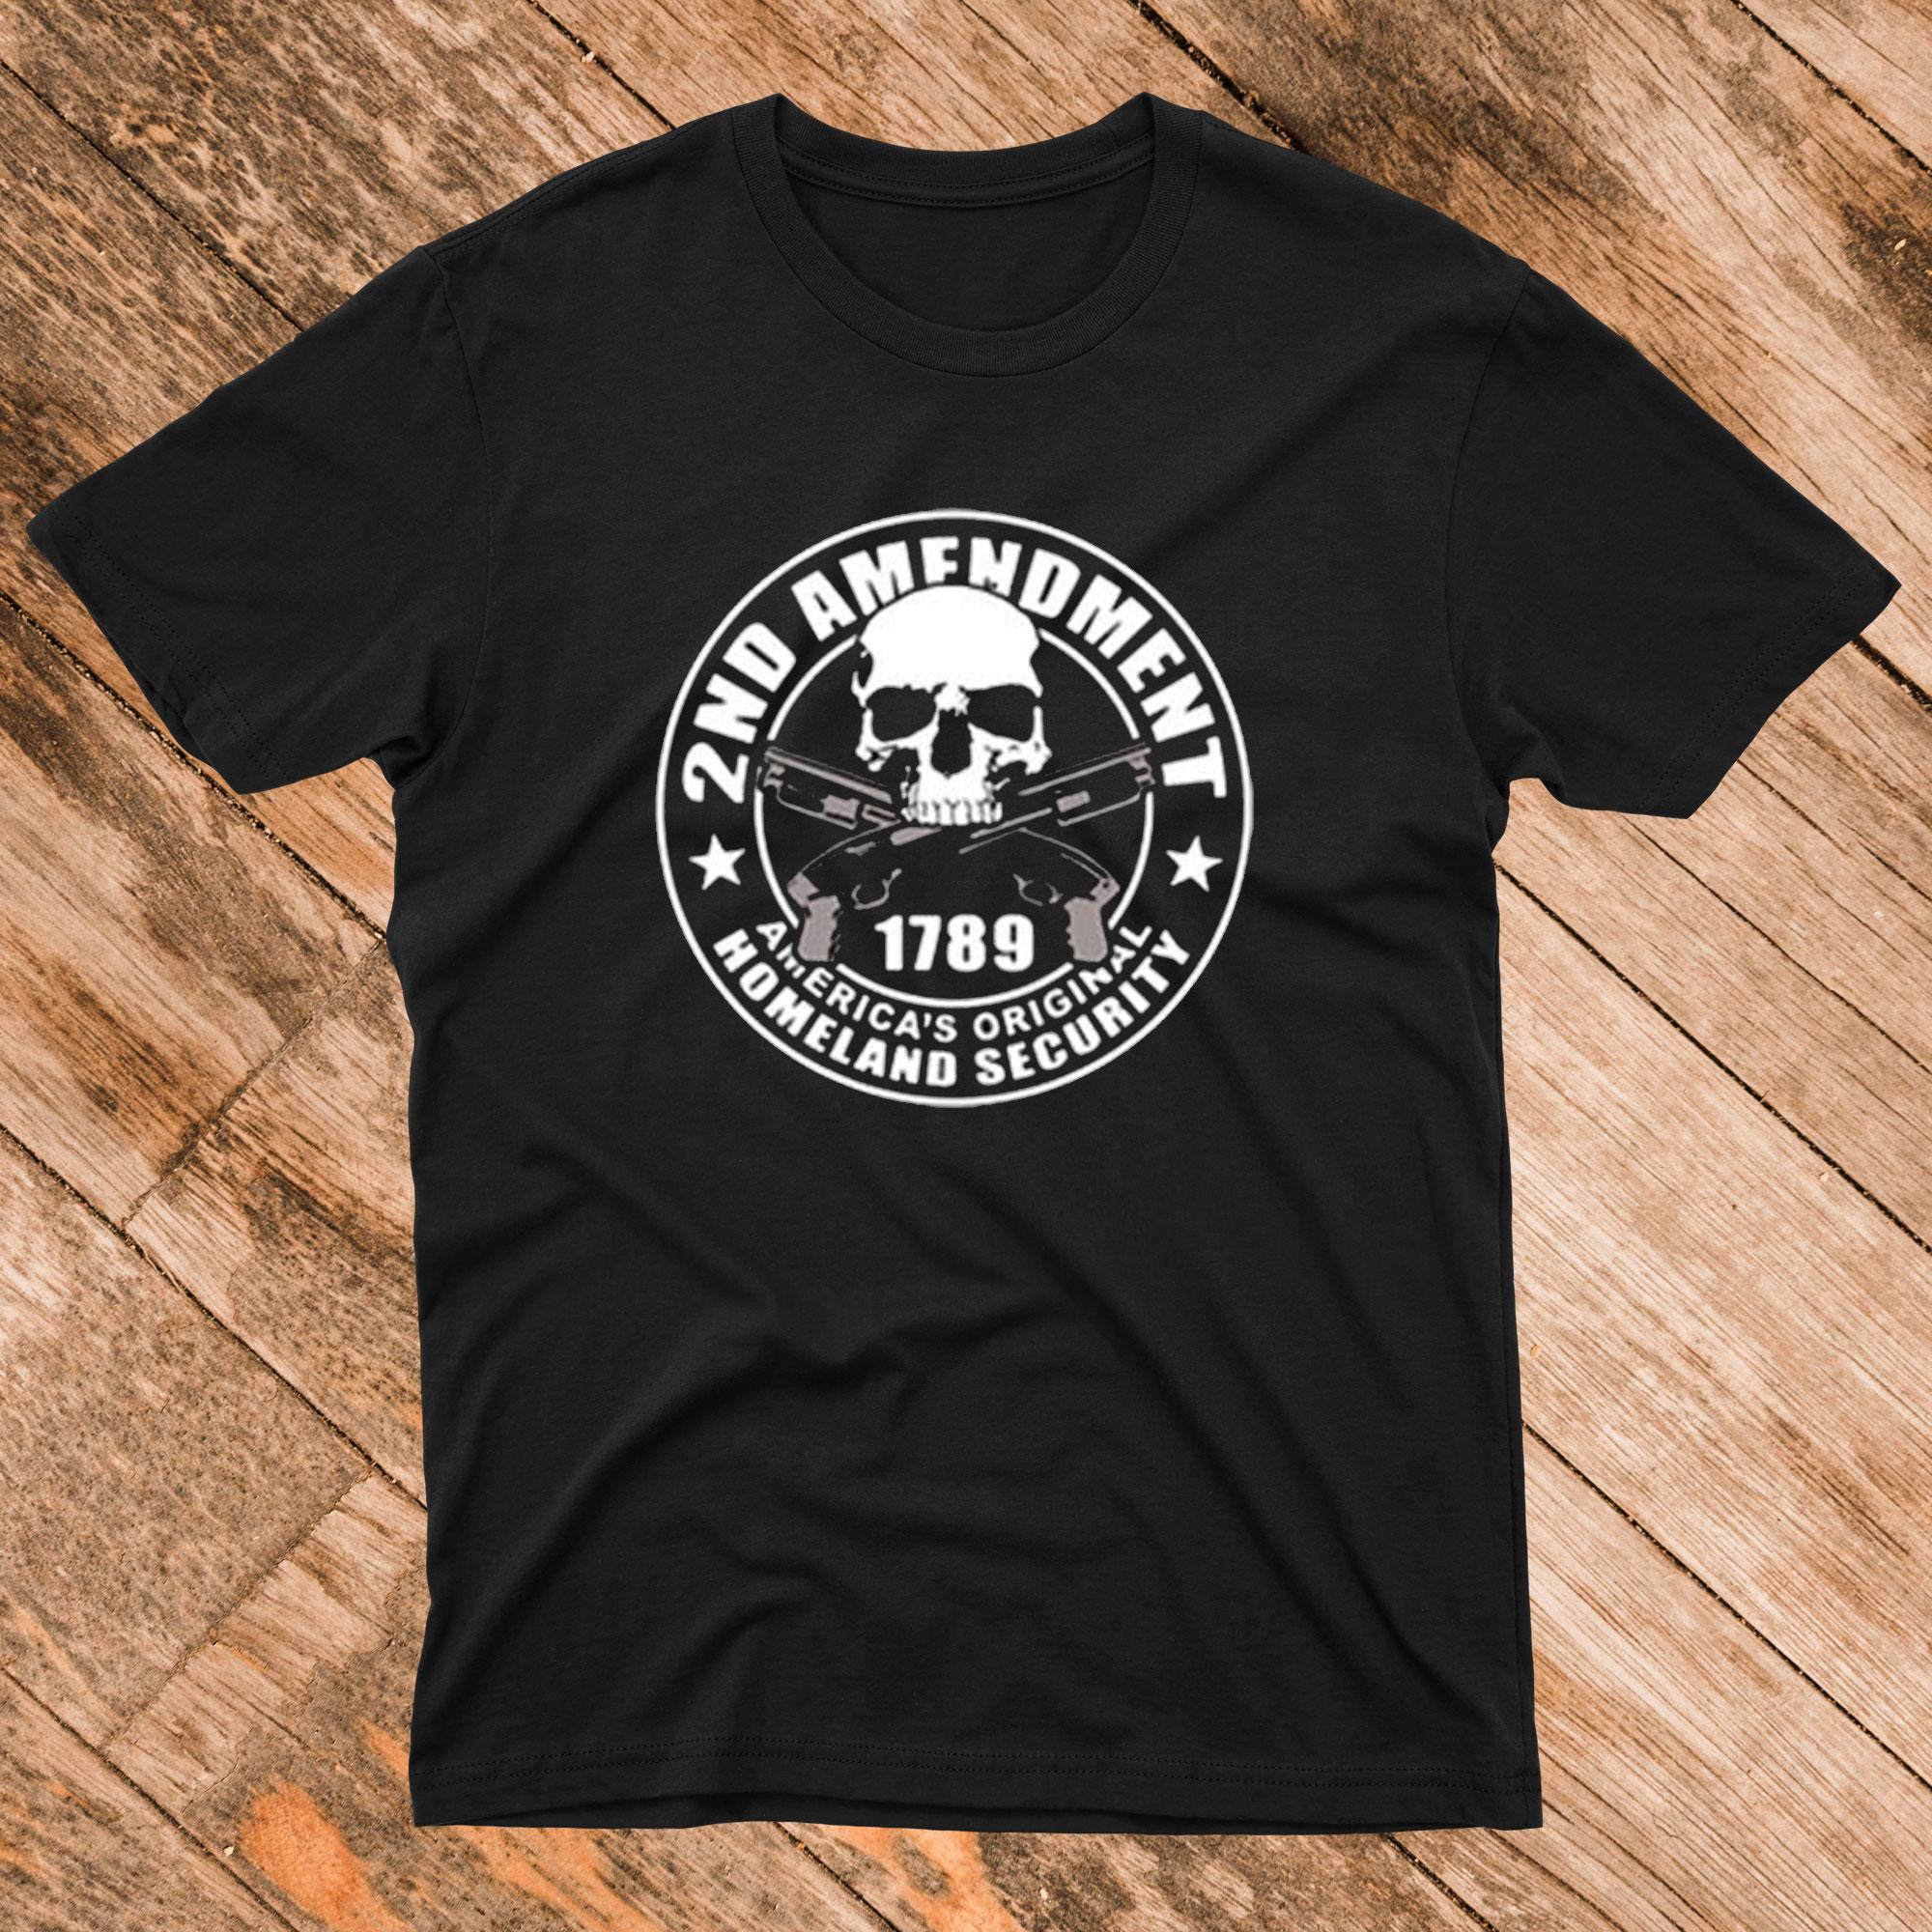 2ND Amendment 1789 T shirt